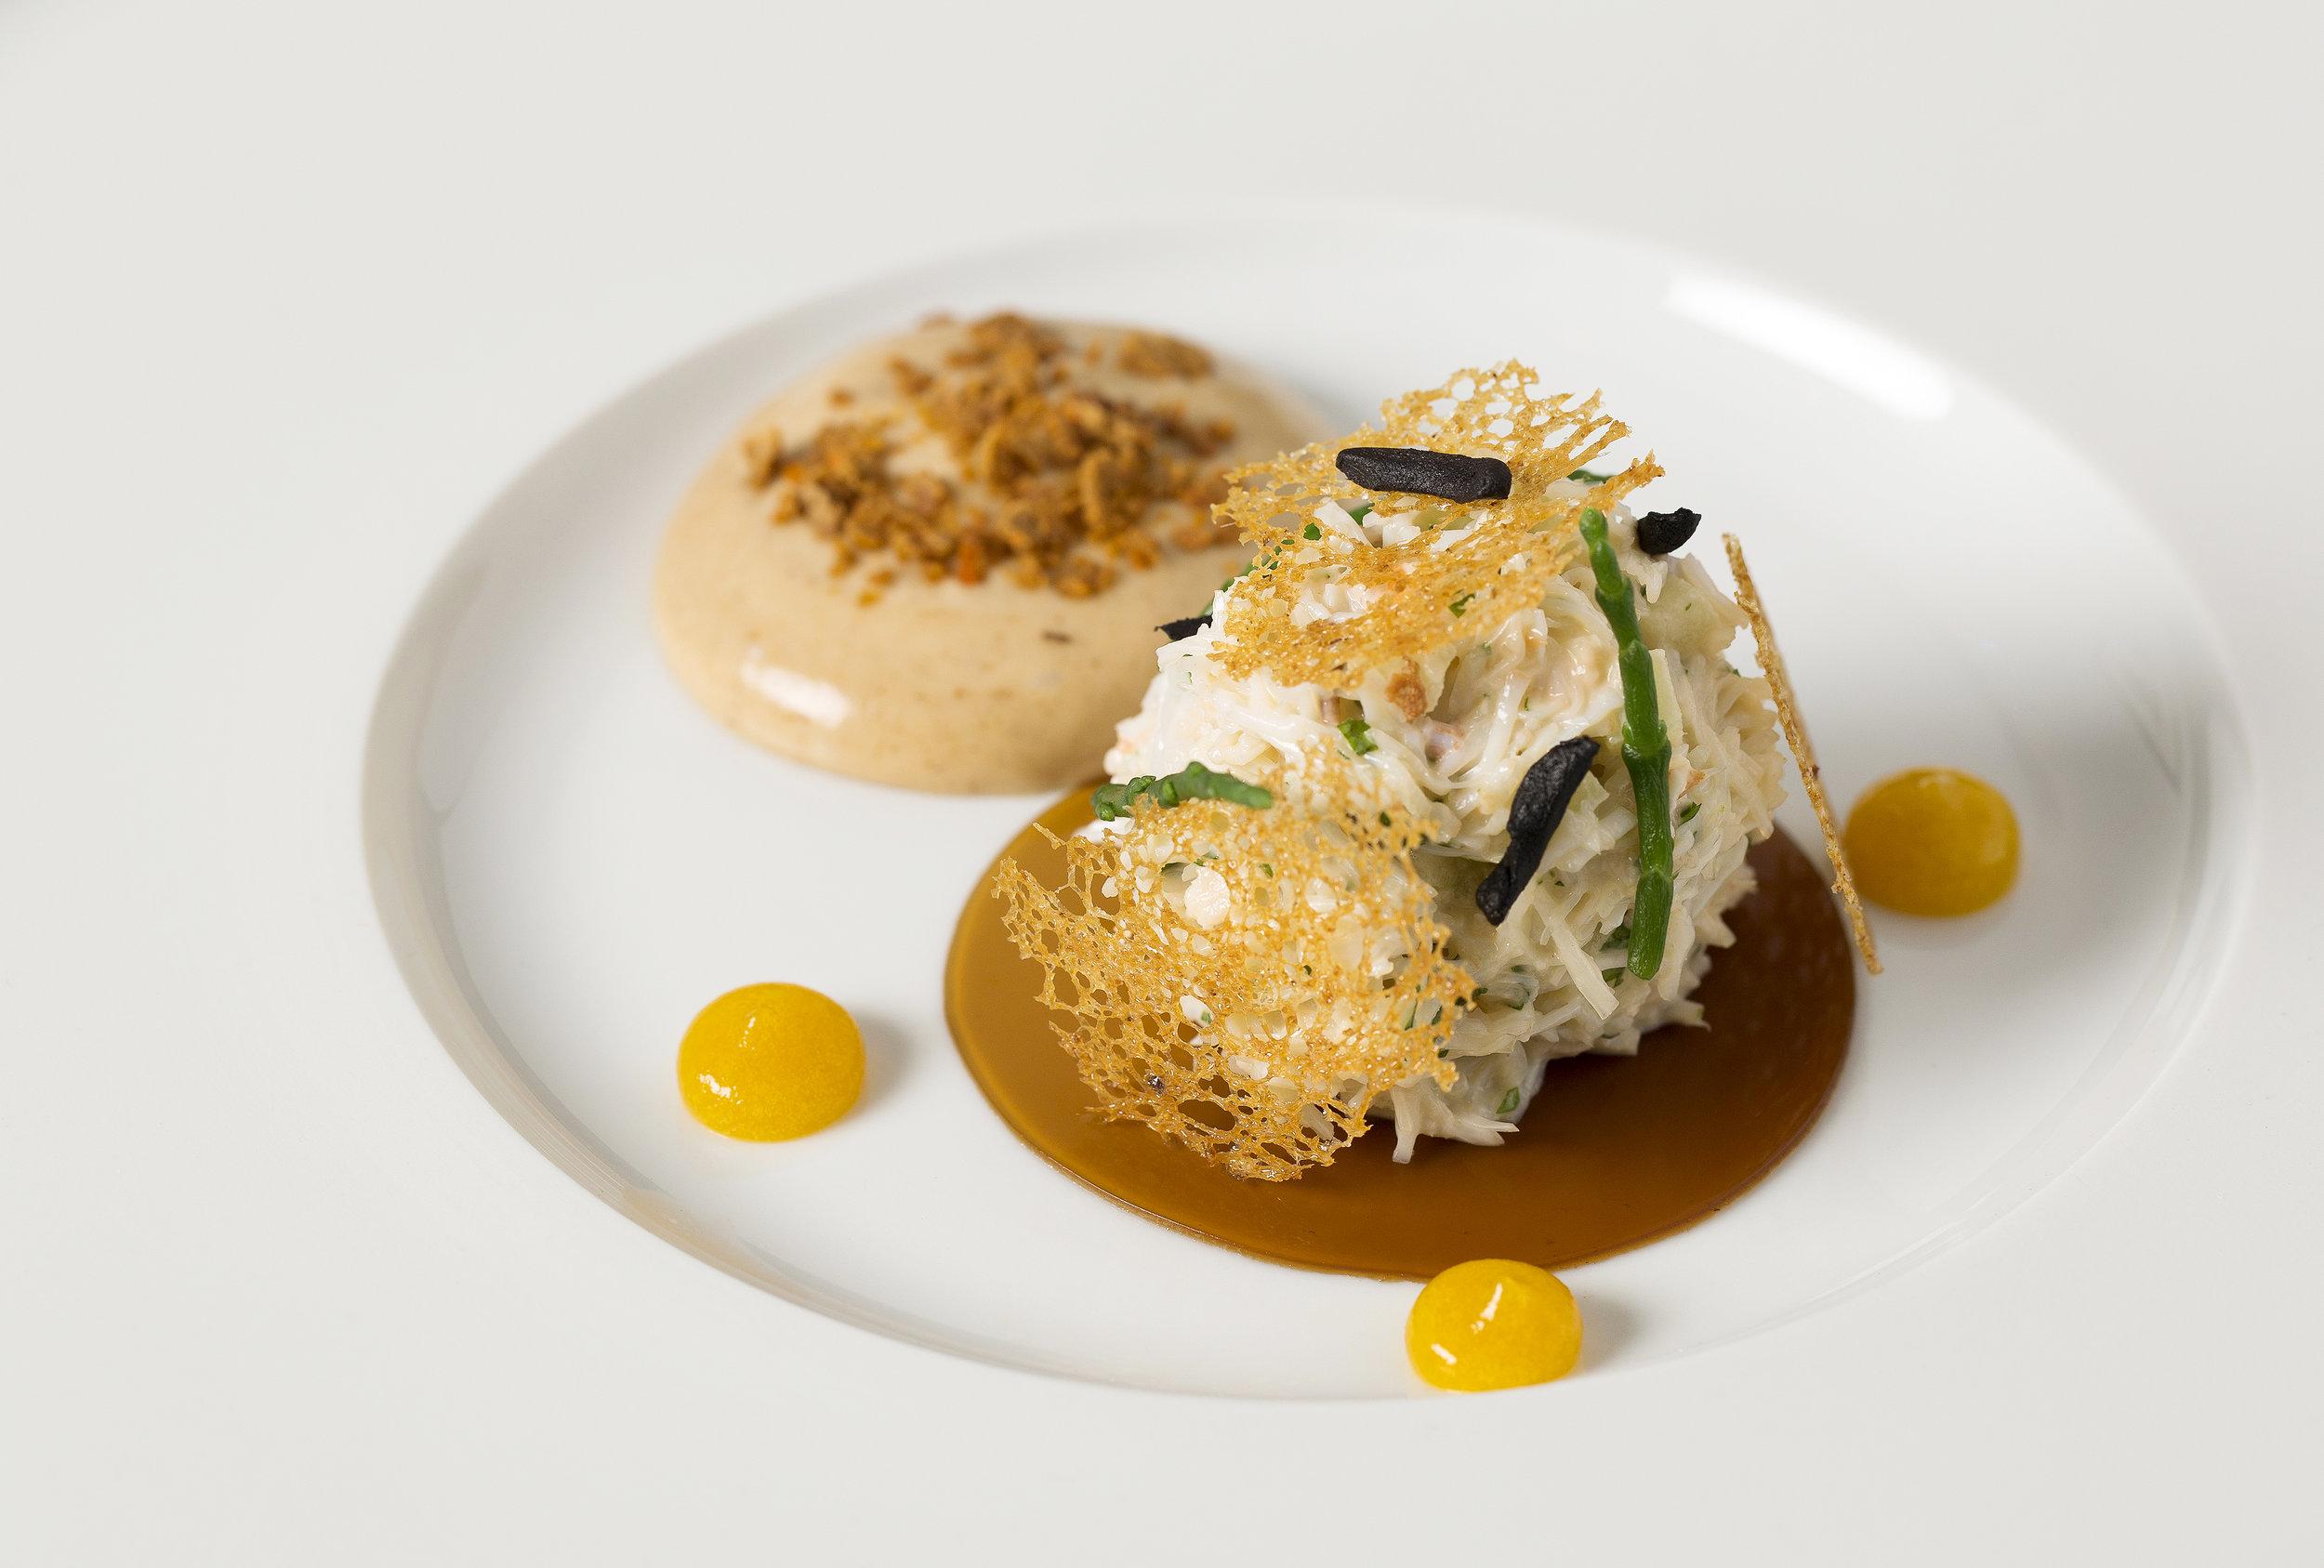 Colchester crab salad, apple _ coriander, black garlic, lemon purée, brown crab foam, sourdough crisps (1).jpg